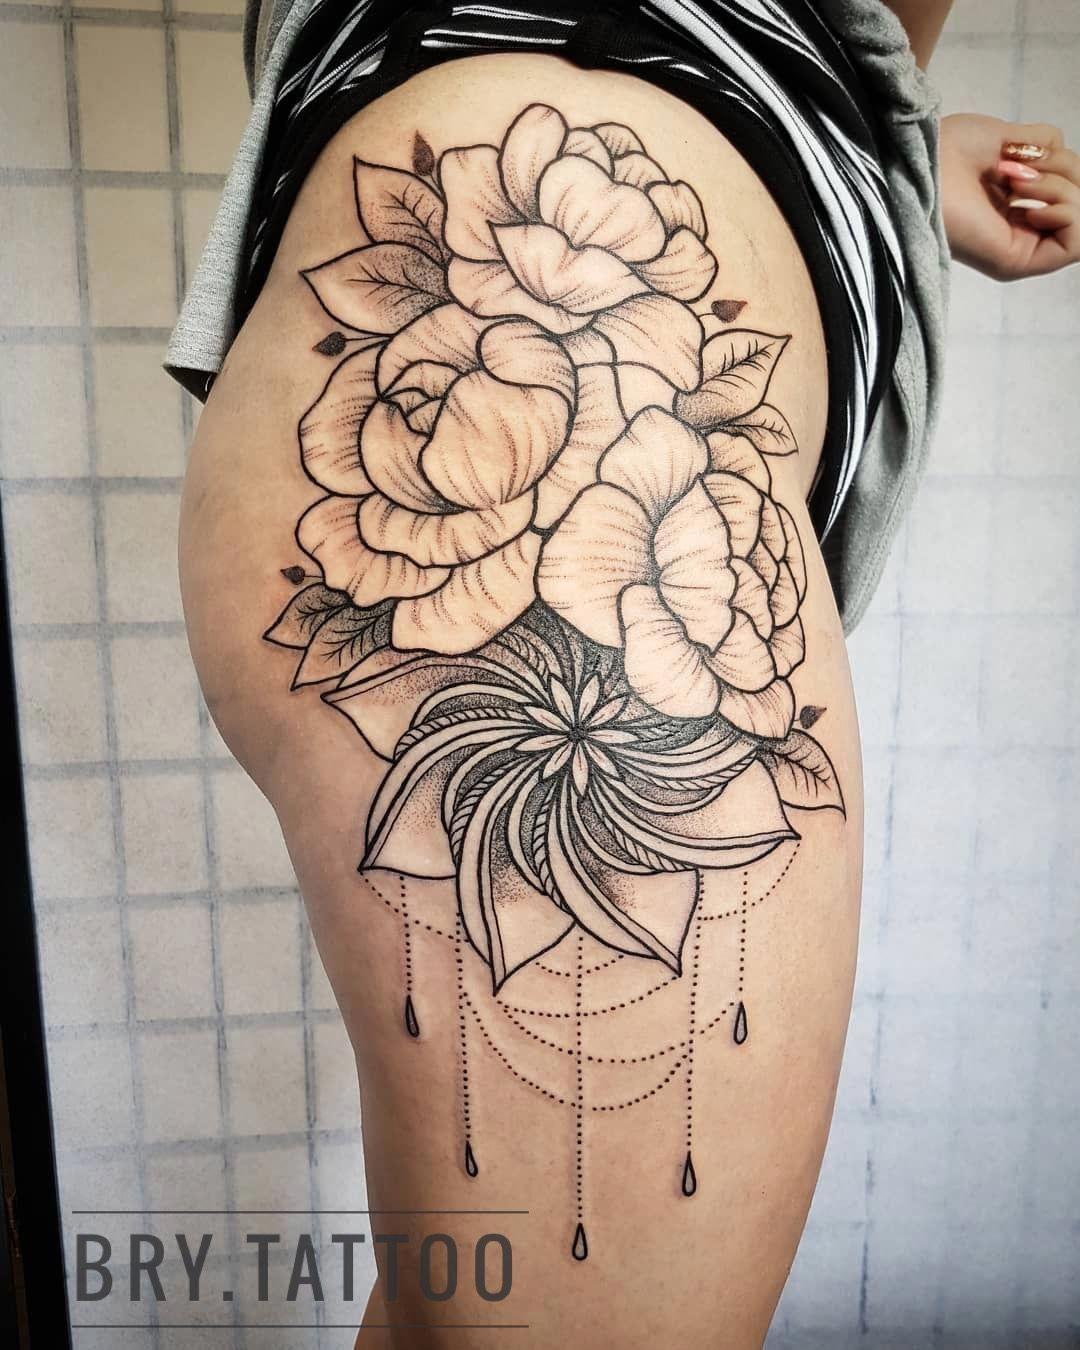 Hip Flowers And A Mandala Tattoo Woman Hiptattoo Inked Mandala Brytattoo Tattoosforwomen Thigh Tattoo Tattoos Hip Tattoos Women